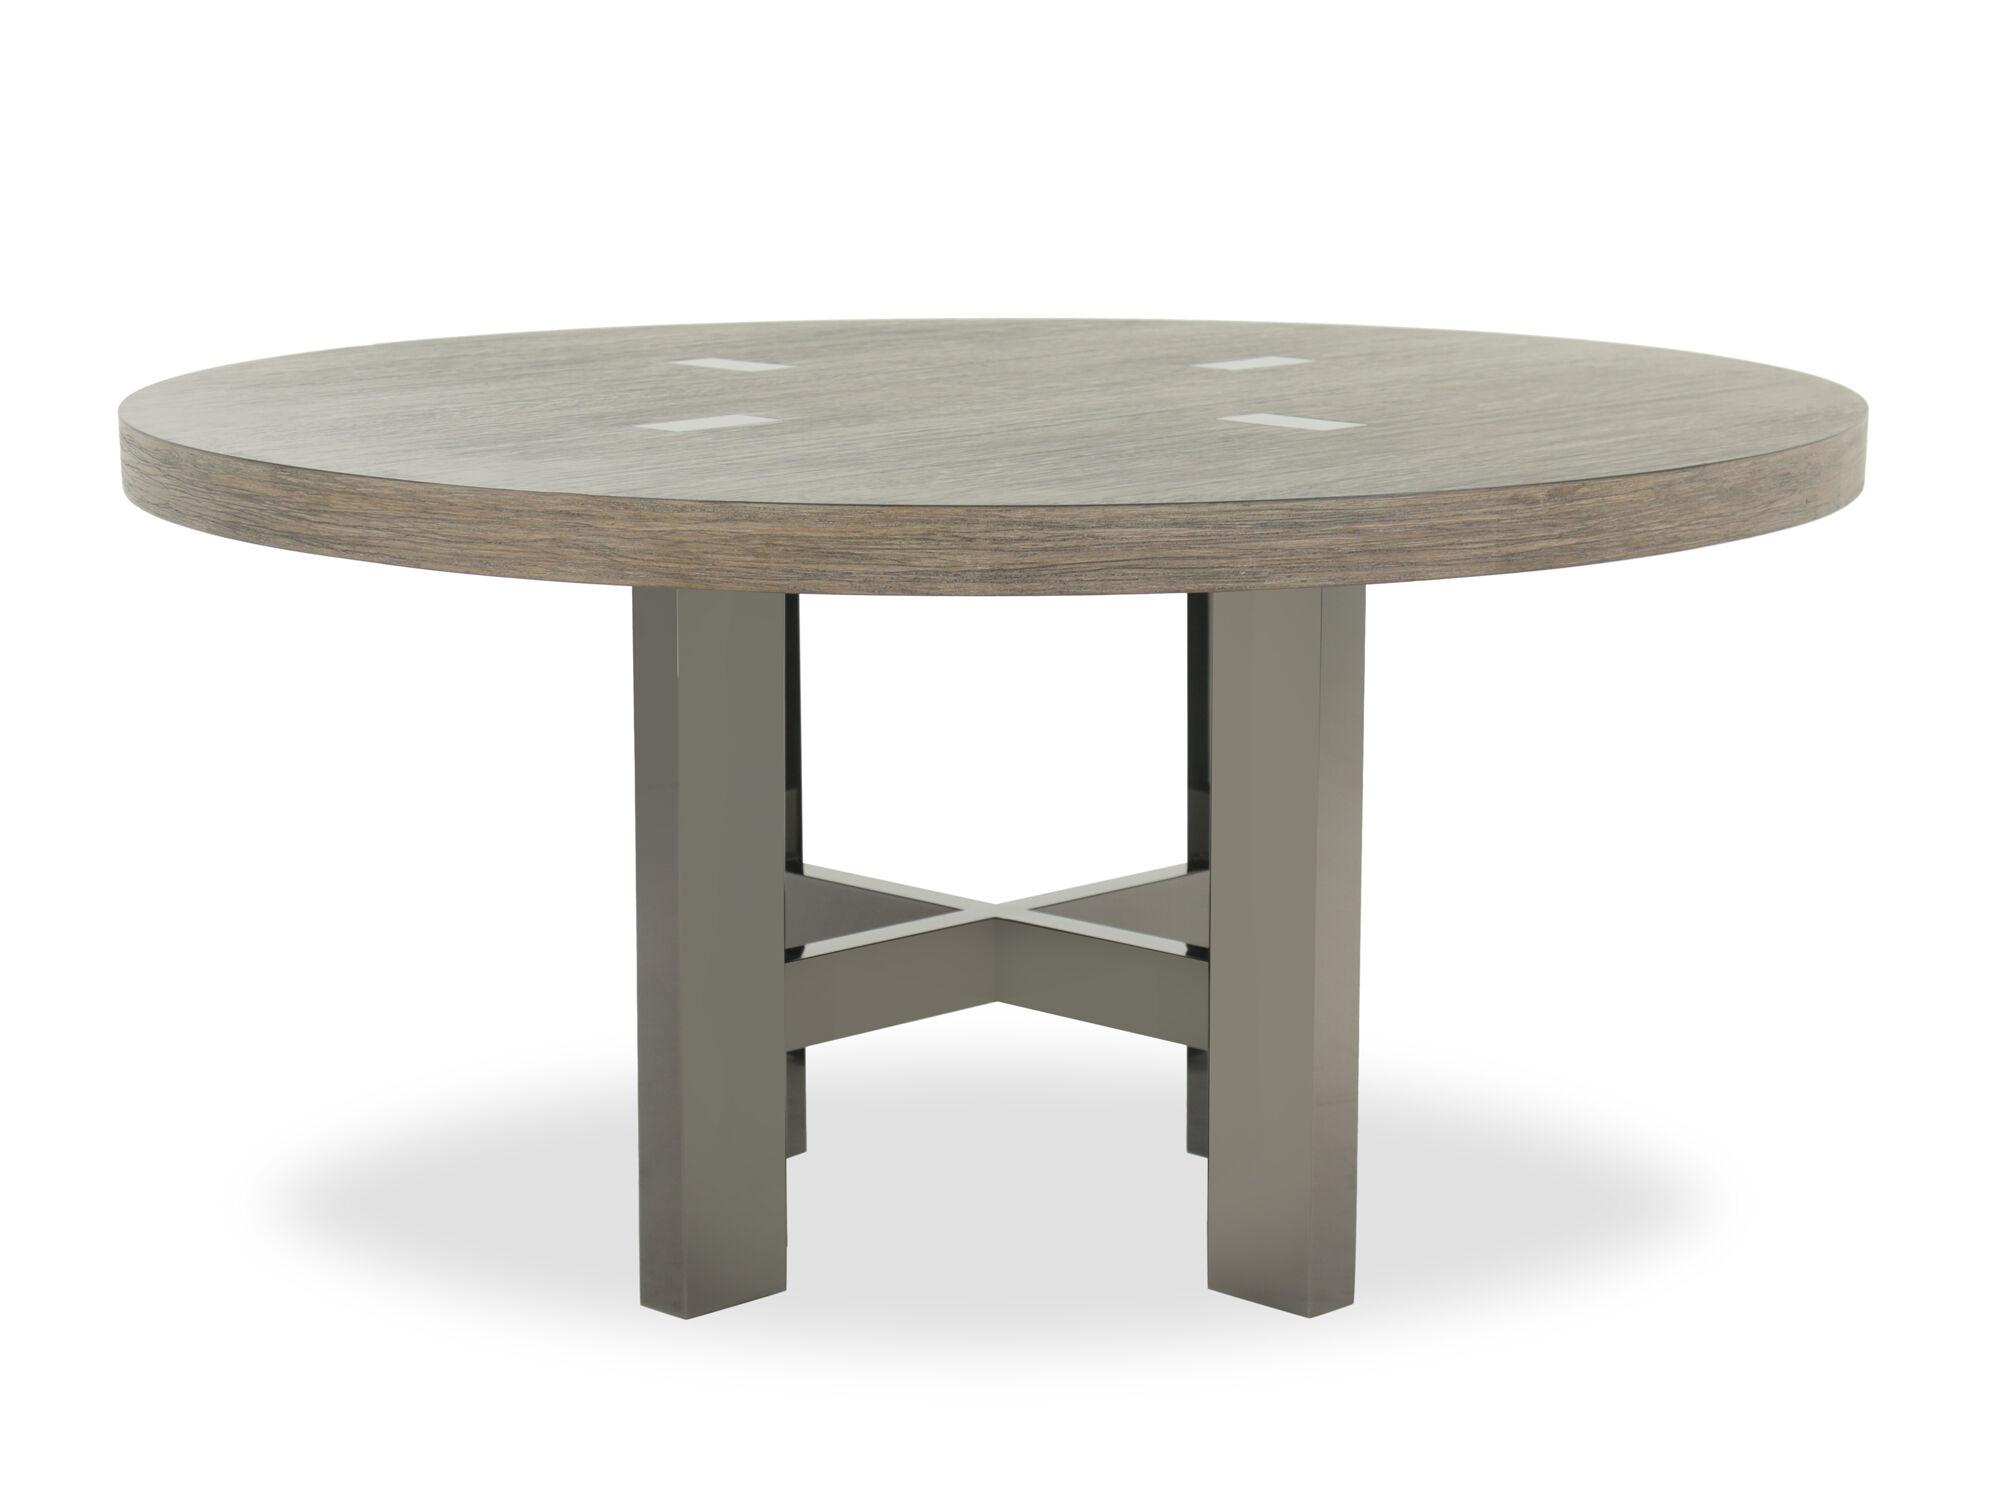 Images Rustic Farmhouse 60u0026quot; Rubberwood Round Pedestal Table In Medium  Brown Rustic Farmhouse 60u0026quot; Rubberwood Round Pedestal Table In Medium  Brown